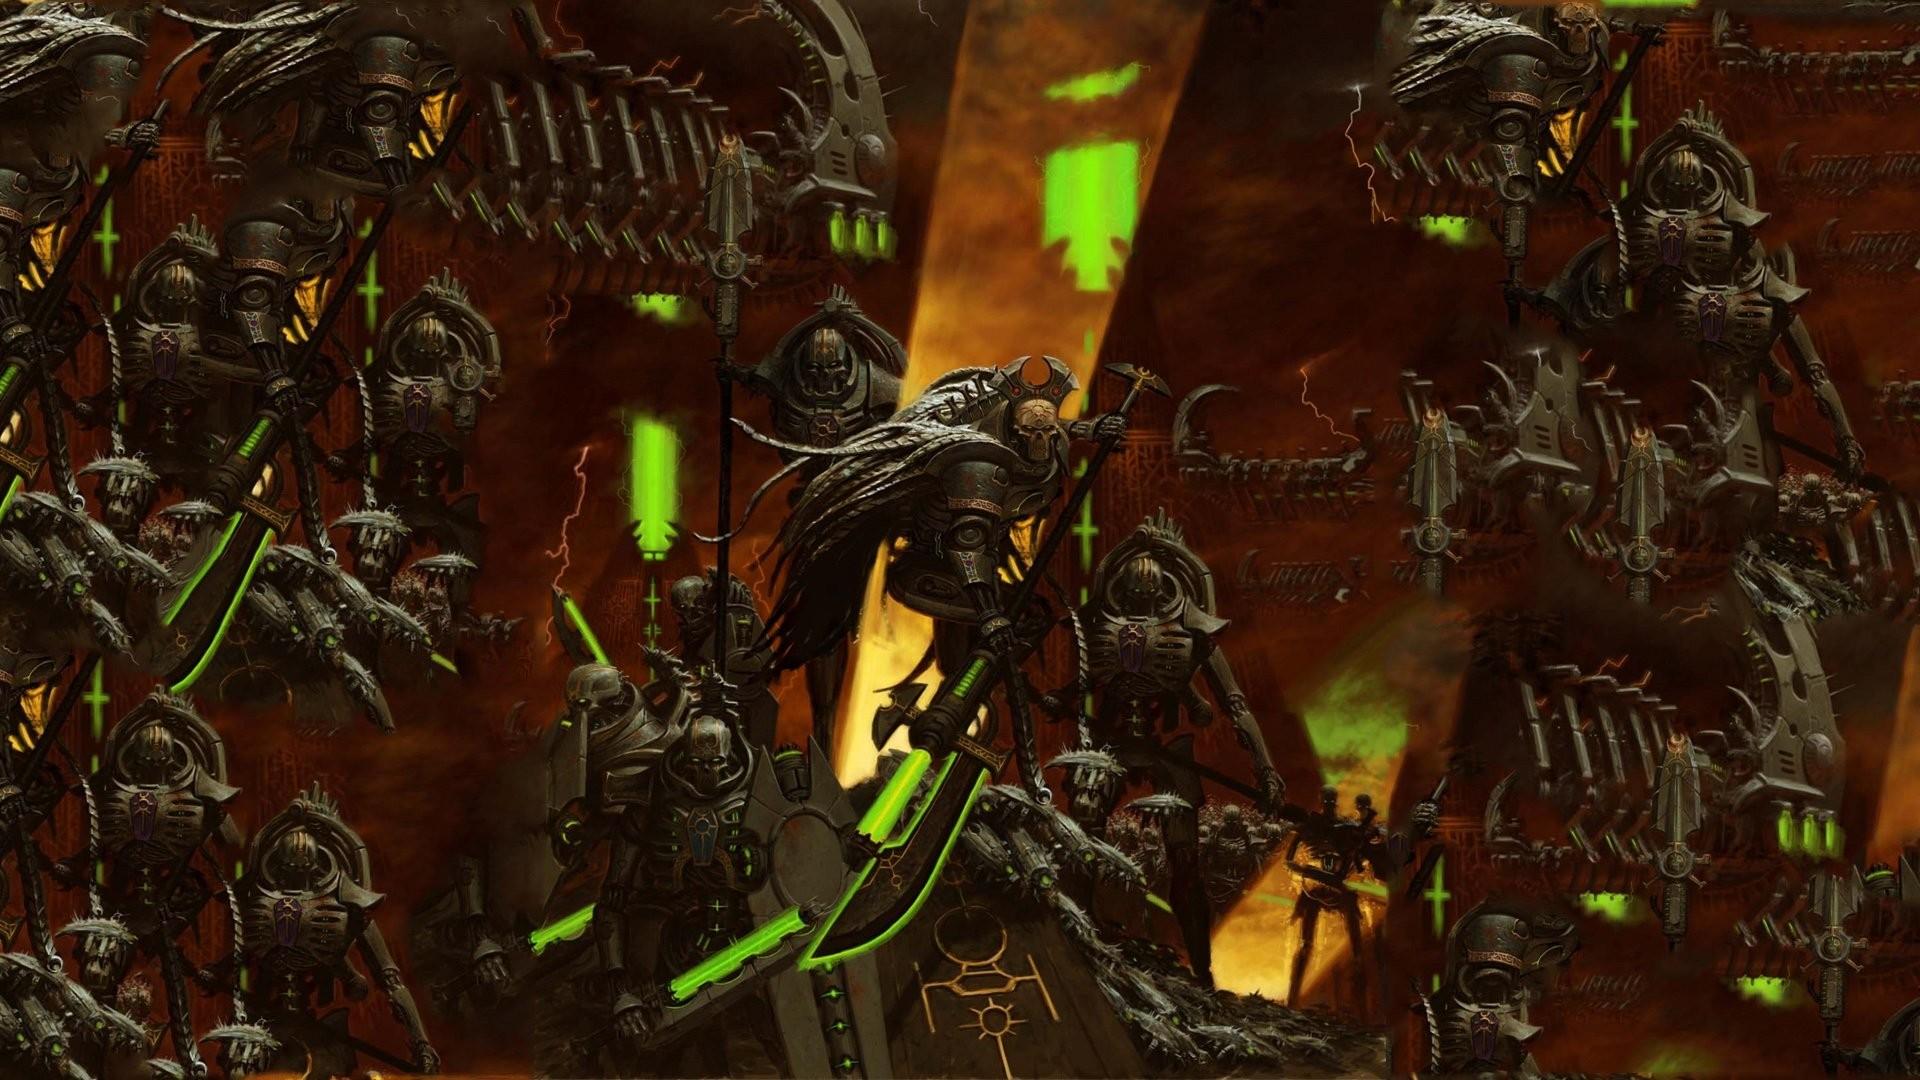 Necron – Warhammer 40,000 wallpaper – Game wallpapers – #28528